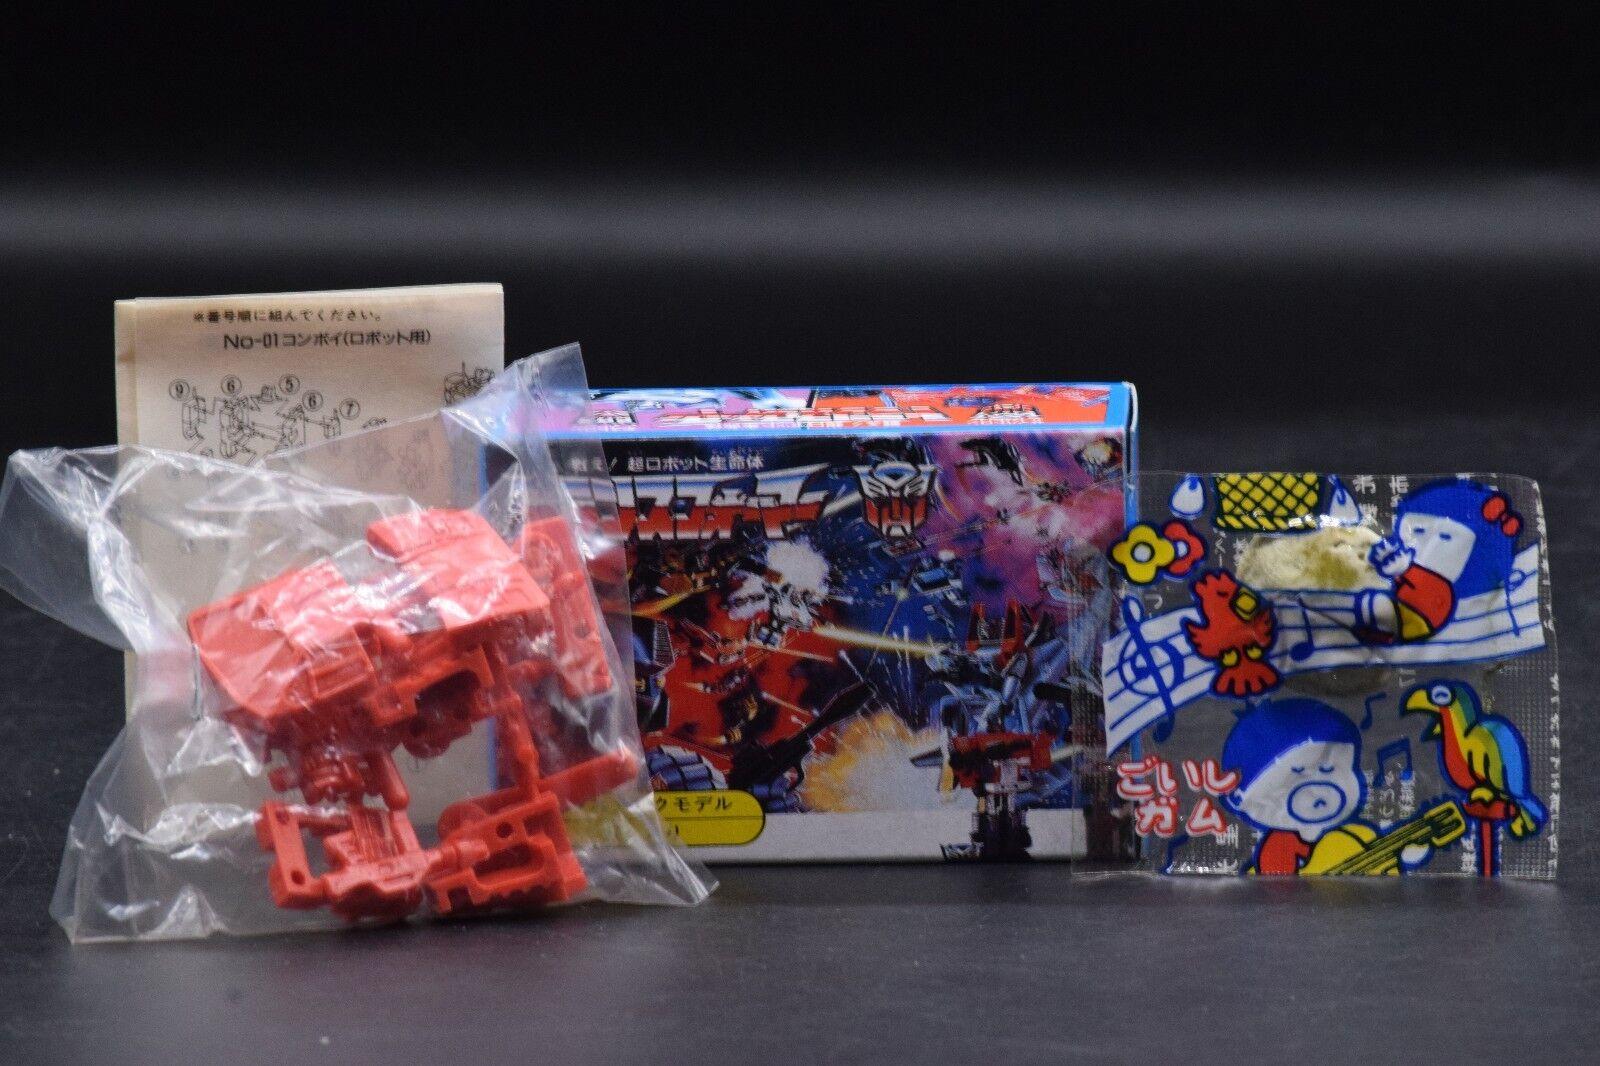 Japanese vintage Transformers SIDESWIPE figure +BOX Takara Japan Autobot toy